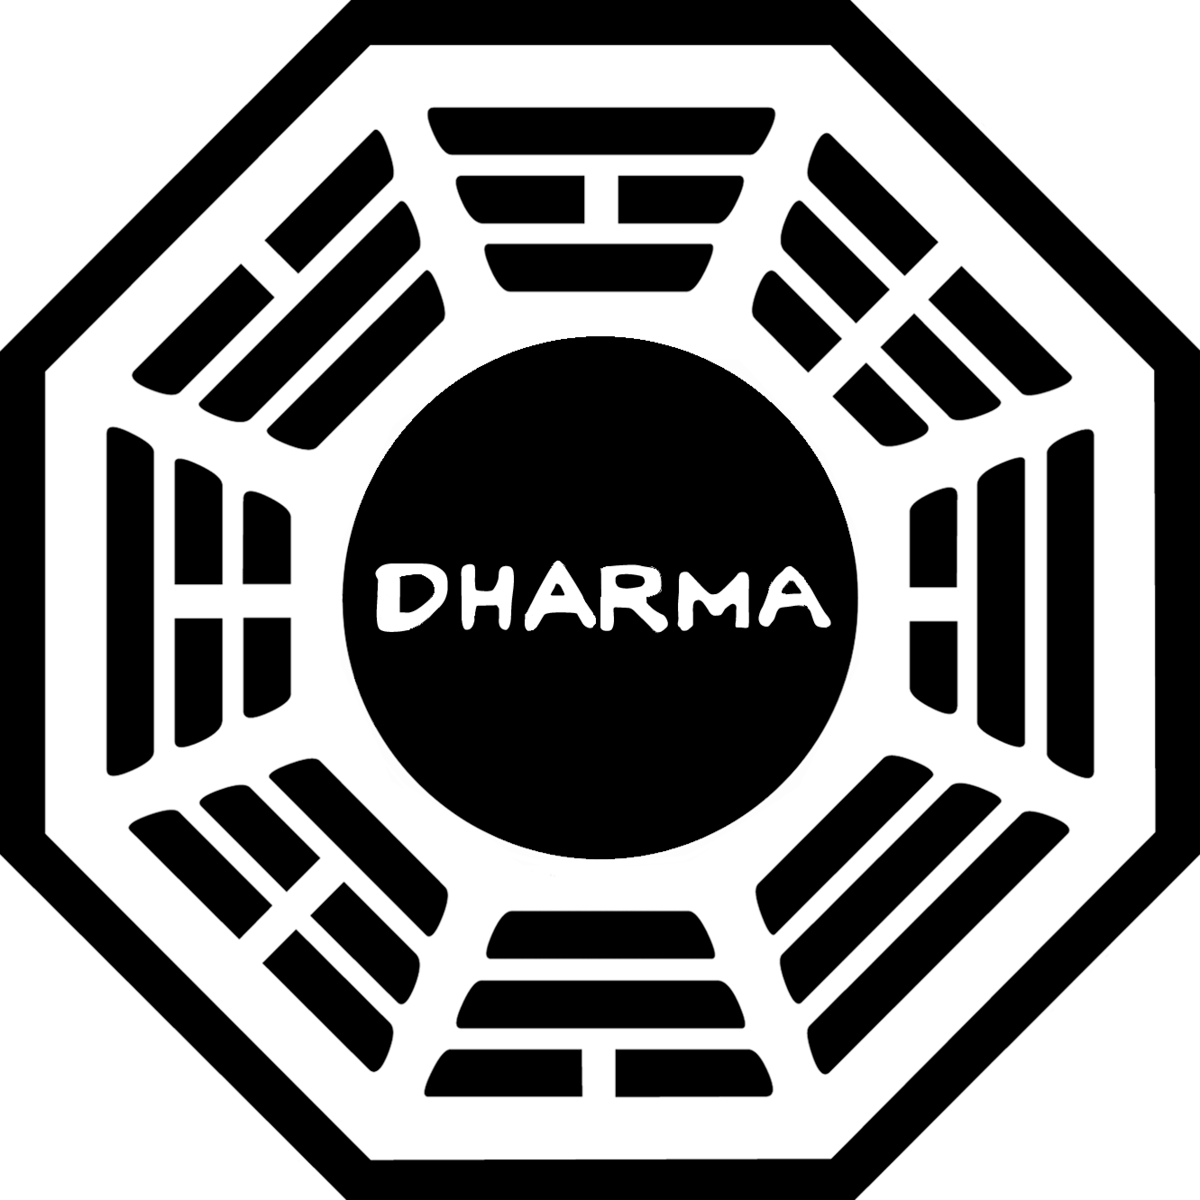 Dharma Initiative  Wikipdia a enciclopdia livre